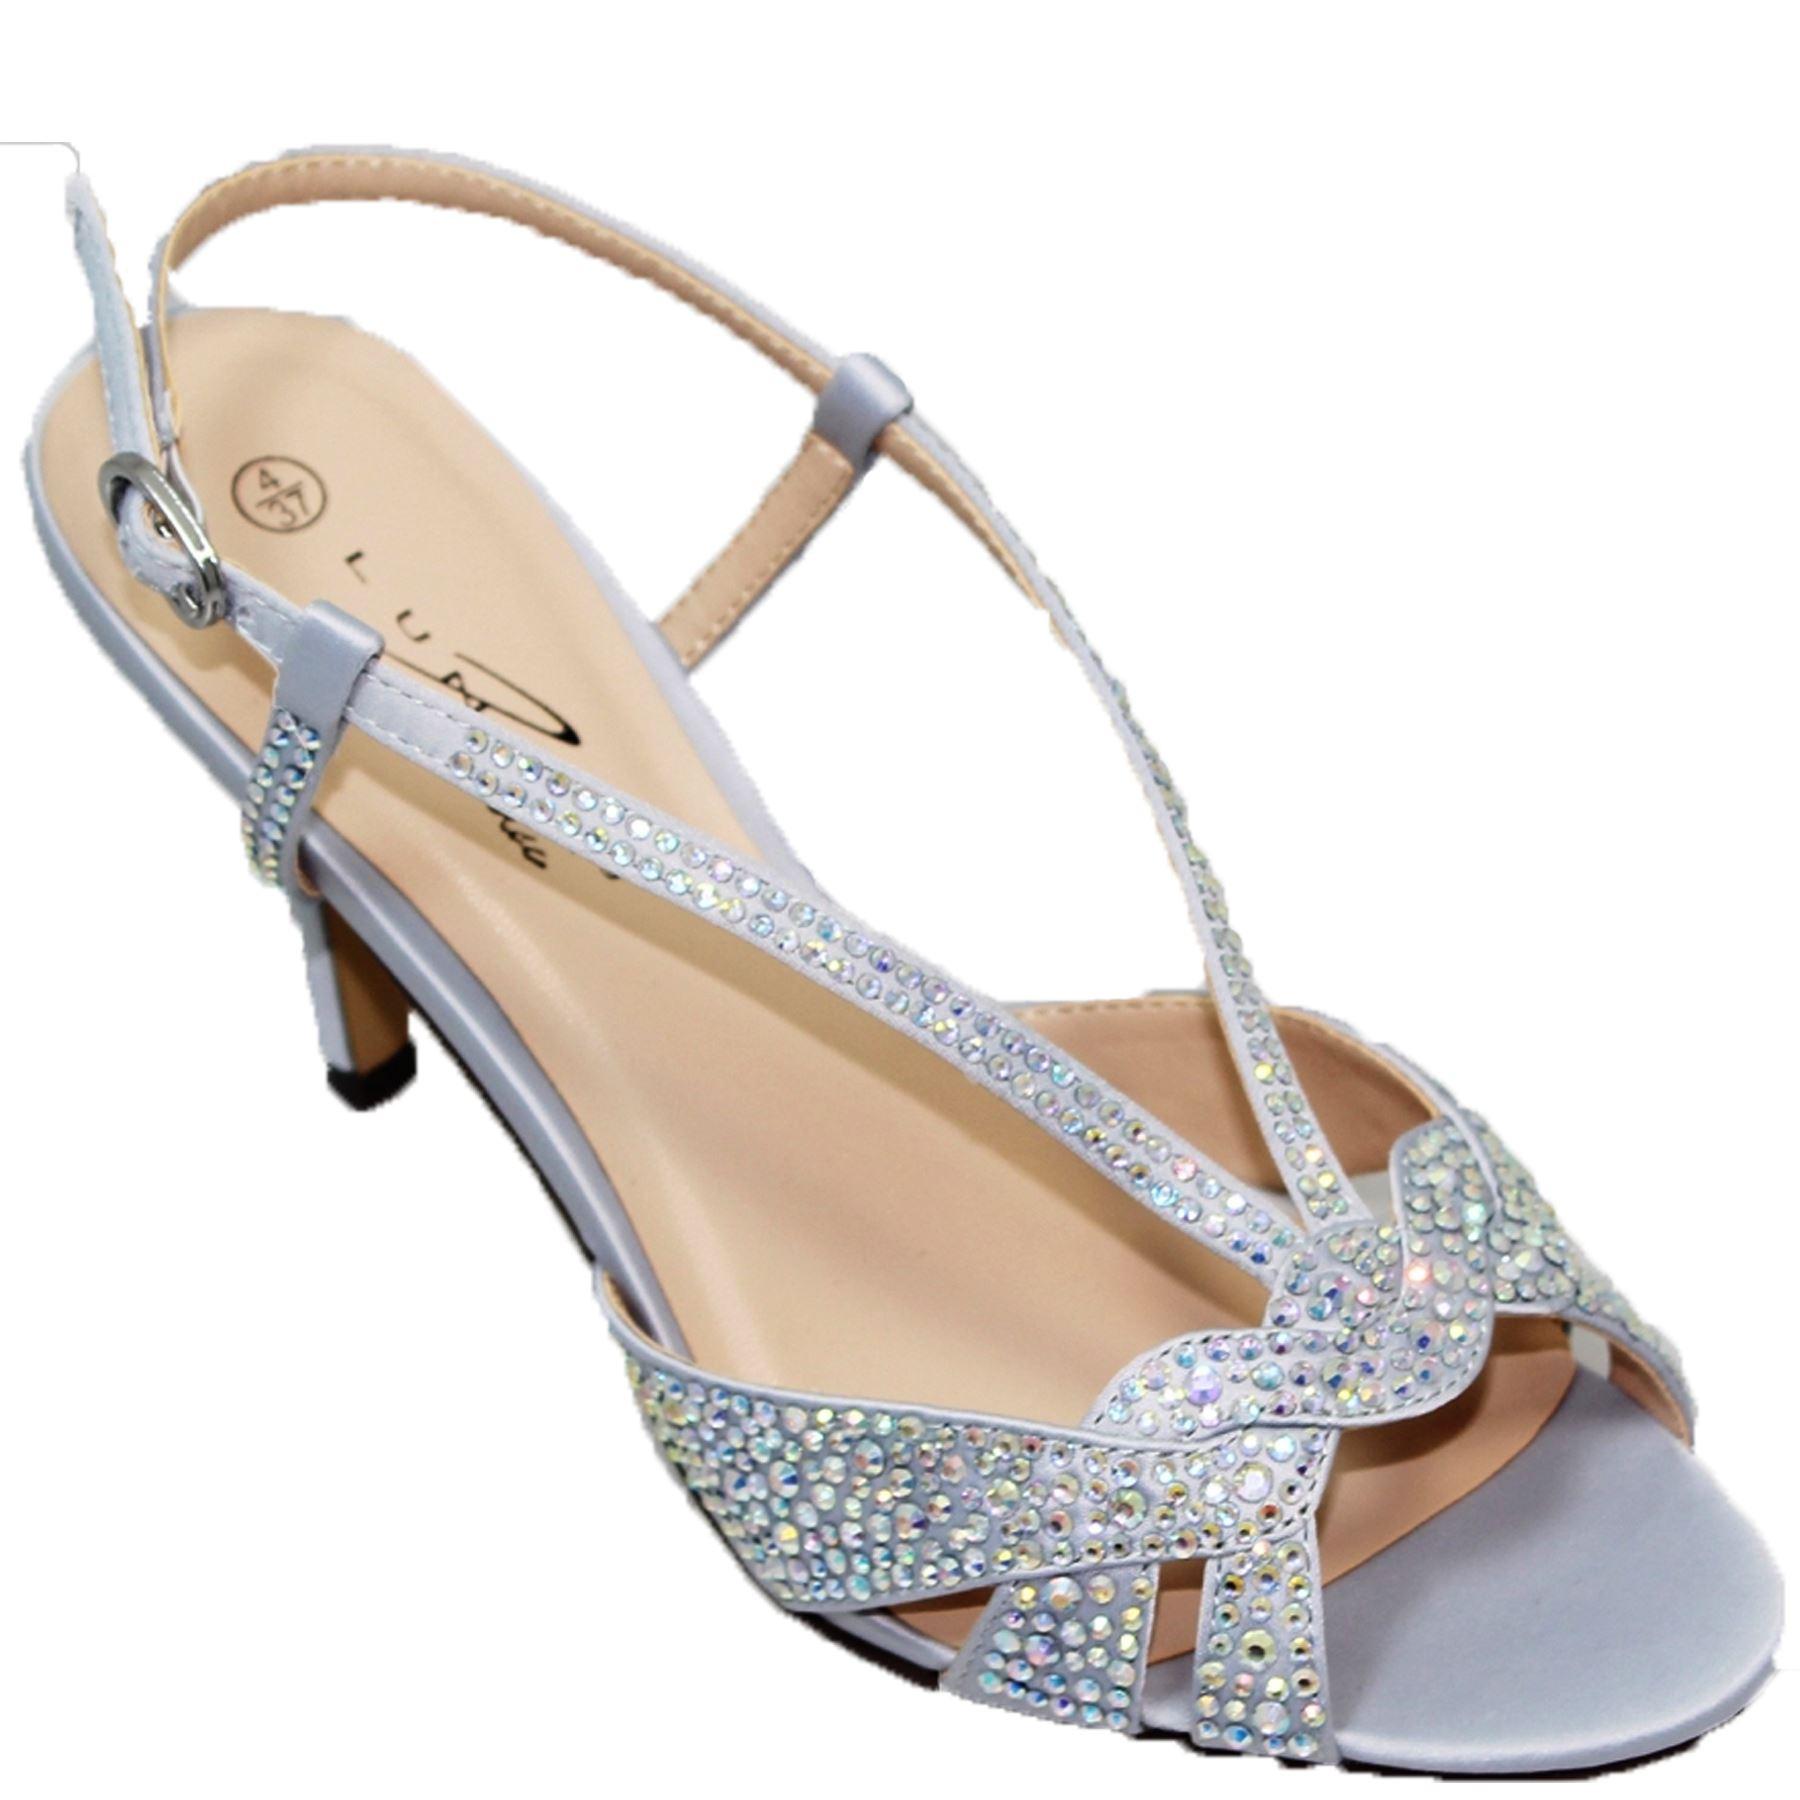 FLR492 Strap Robin Satin Gemstone Ankle Buckle Strap FLR492 Padded Insole Clutch Heels bf6753